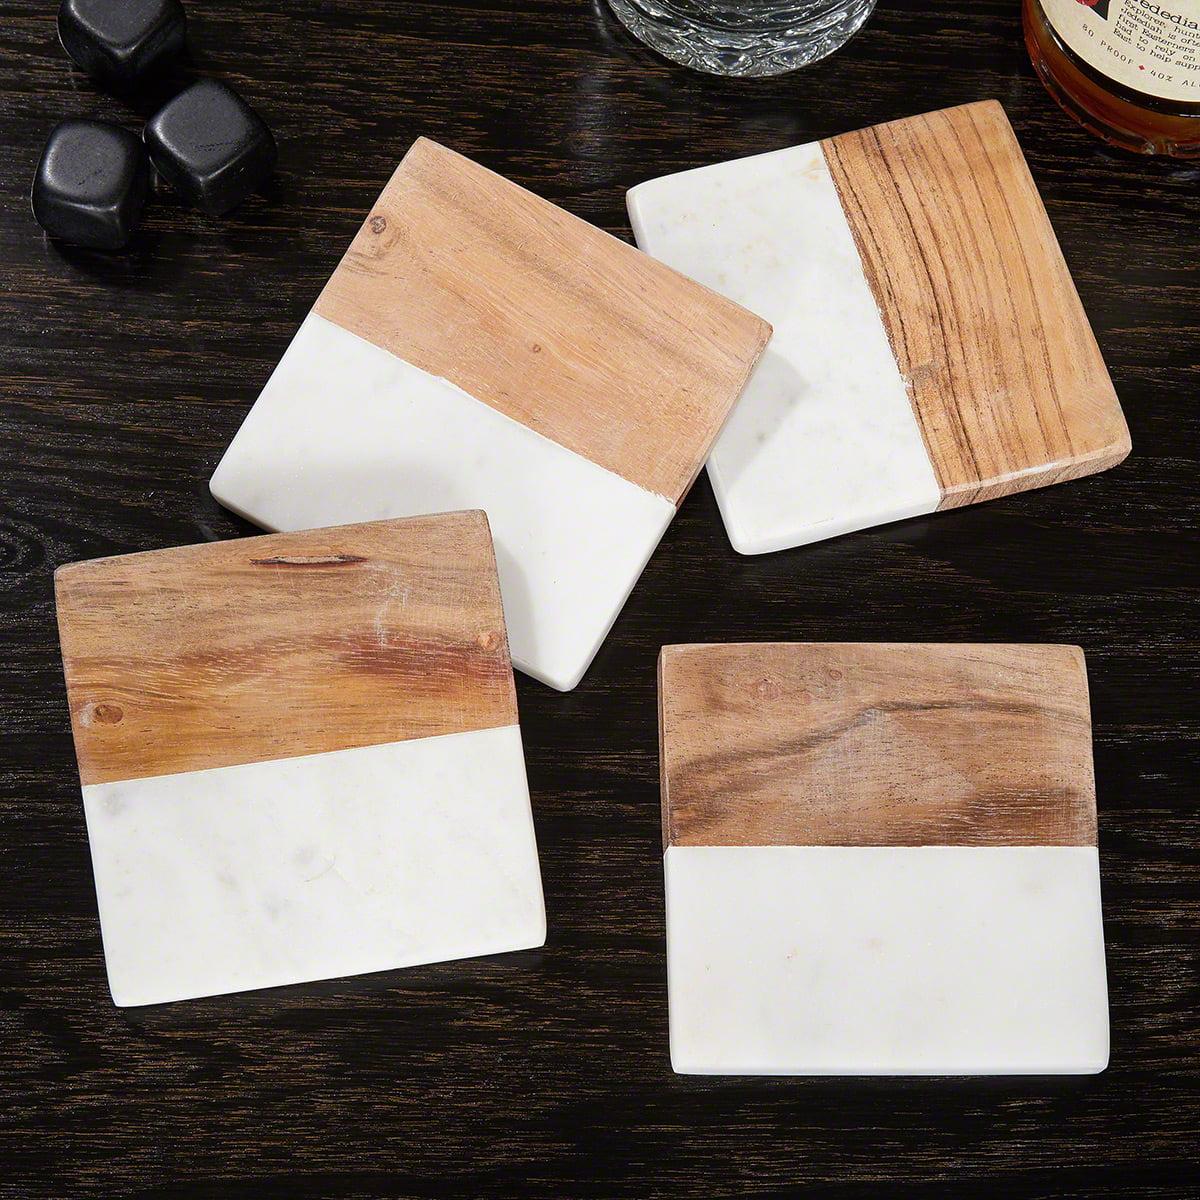 Ingram White Marble & Acacia Wood Coasters Modern Clean Design, Set of 4 by HomeWetBar